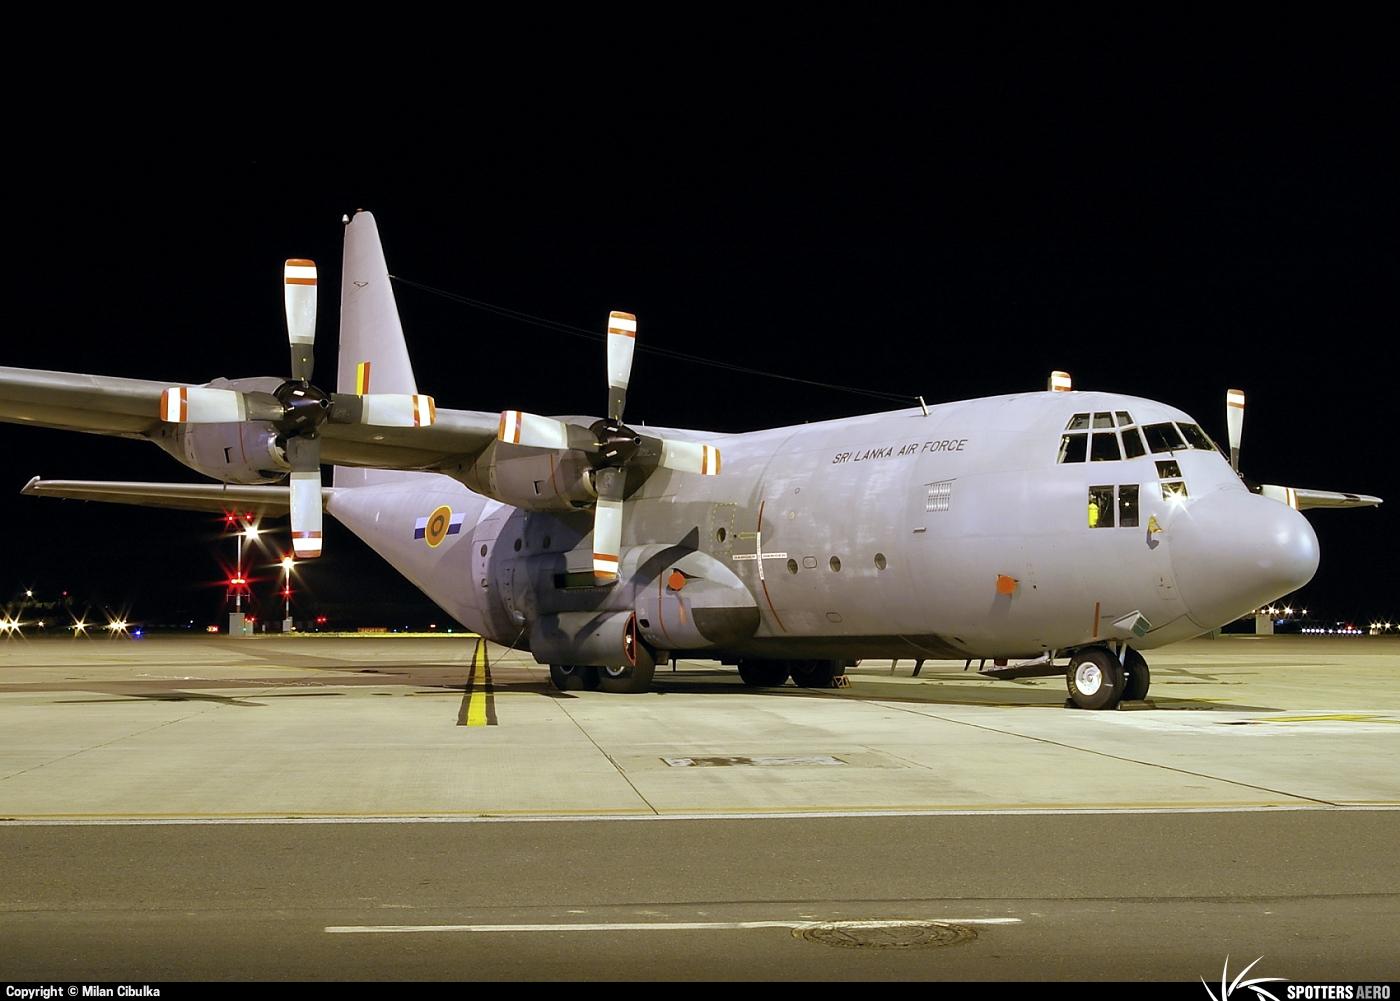 armée Sri-lankaise / Sri Lanka Armed Forces - Page 2 0000070173_large